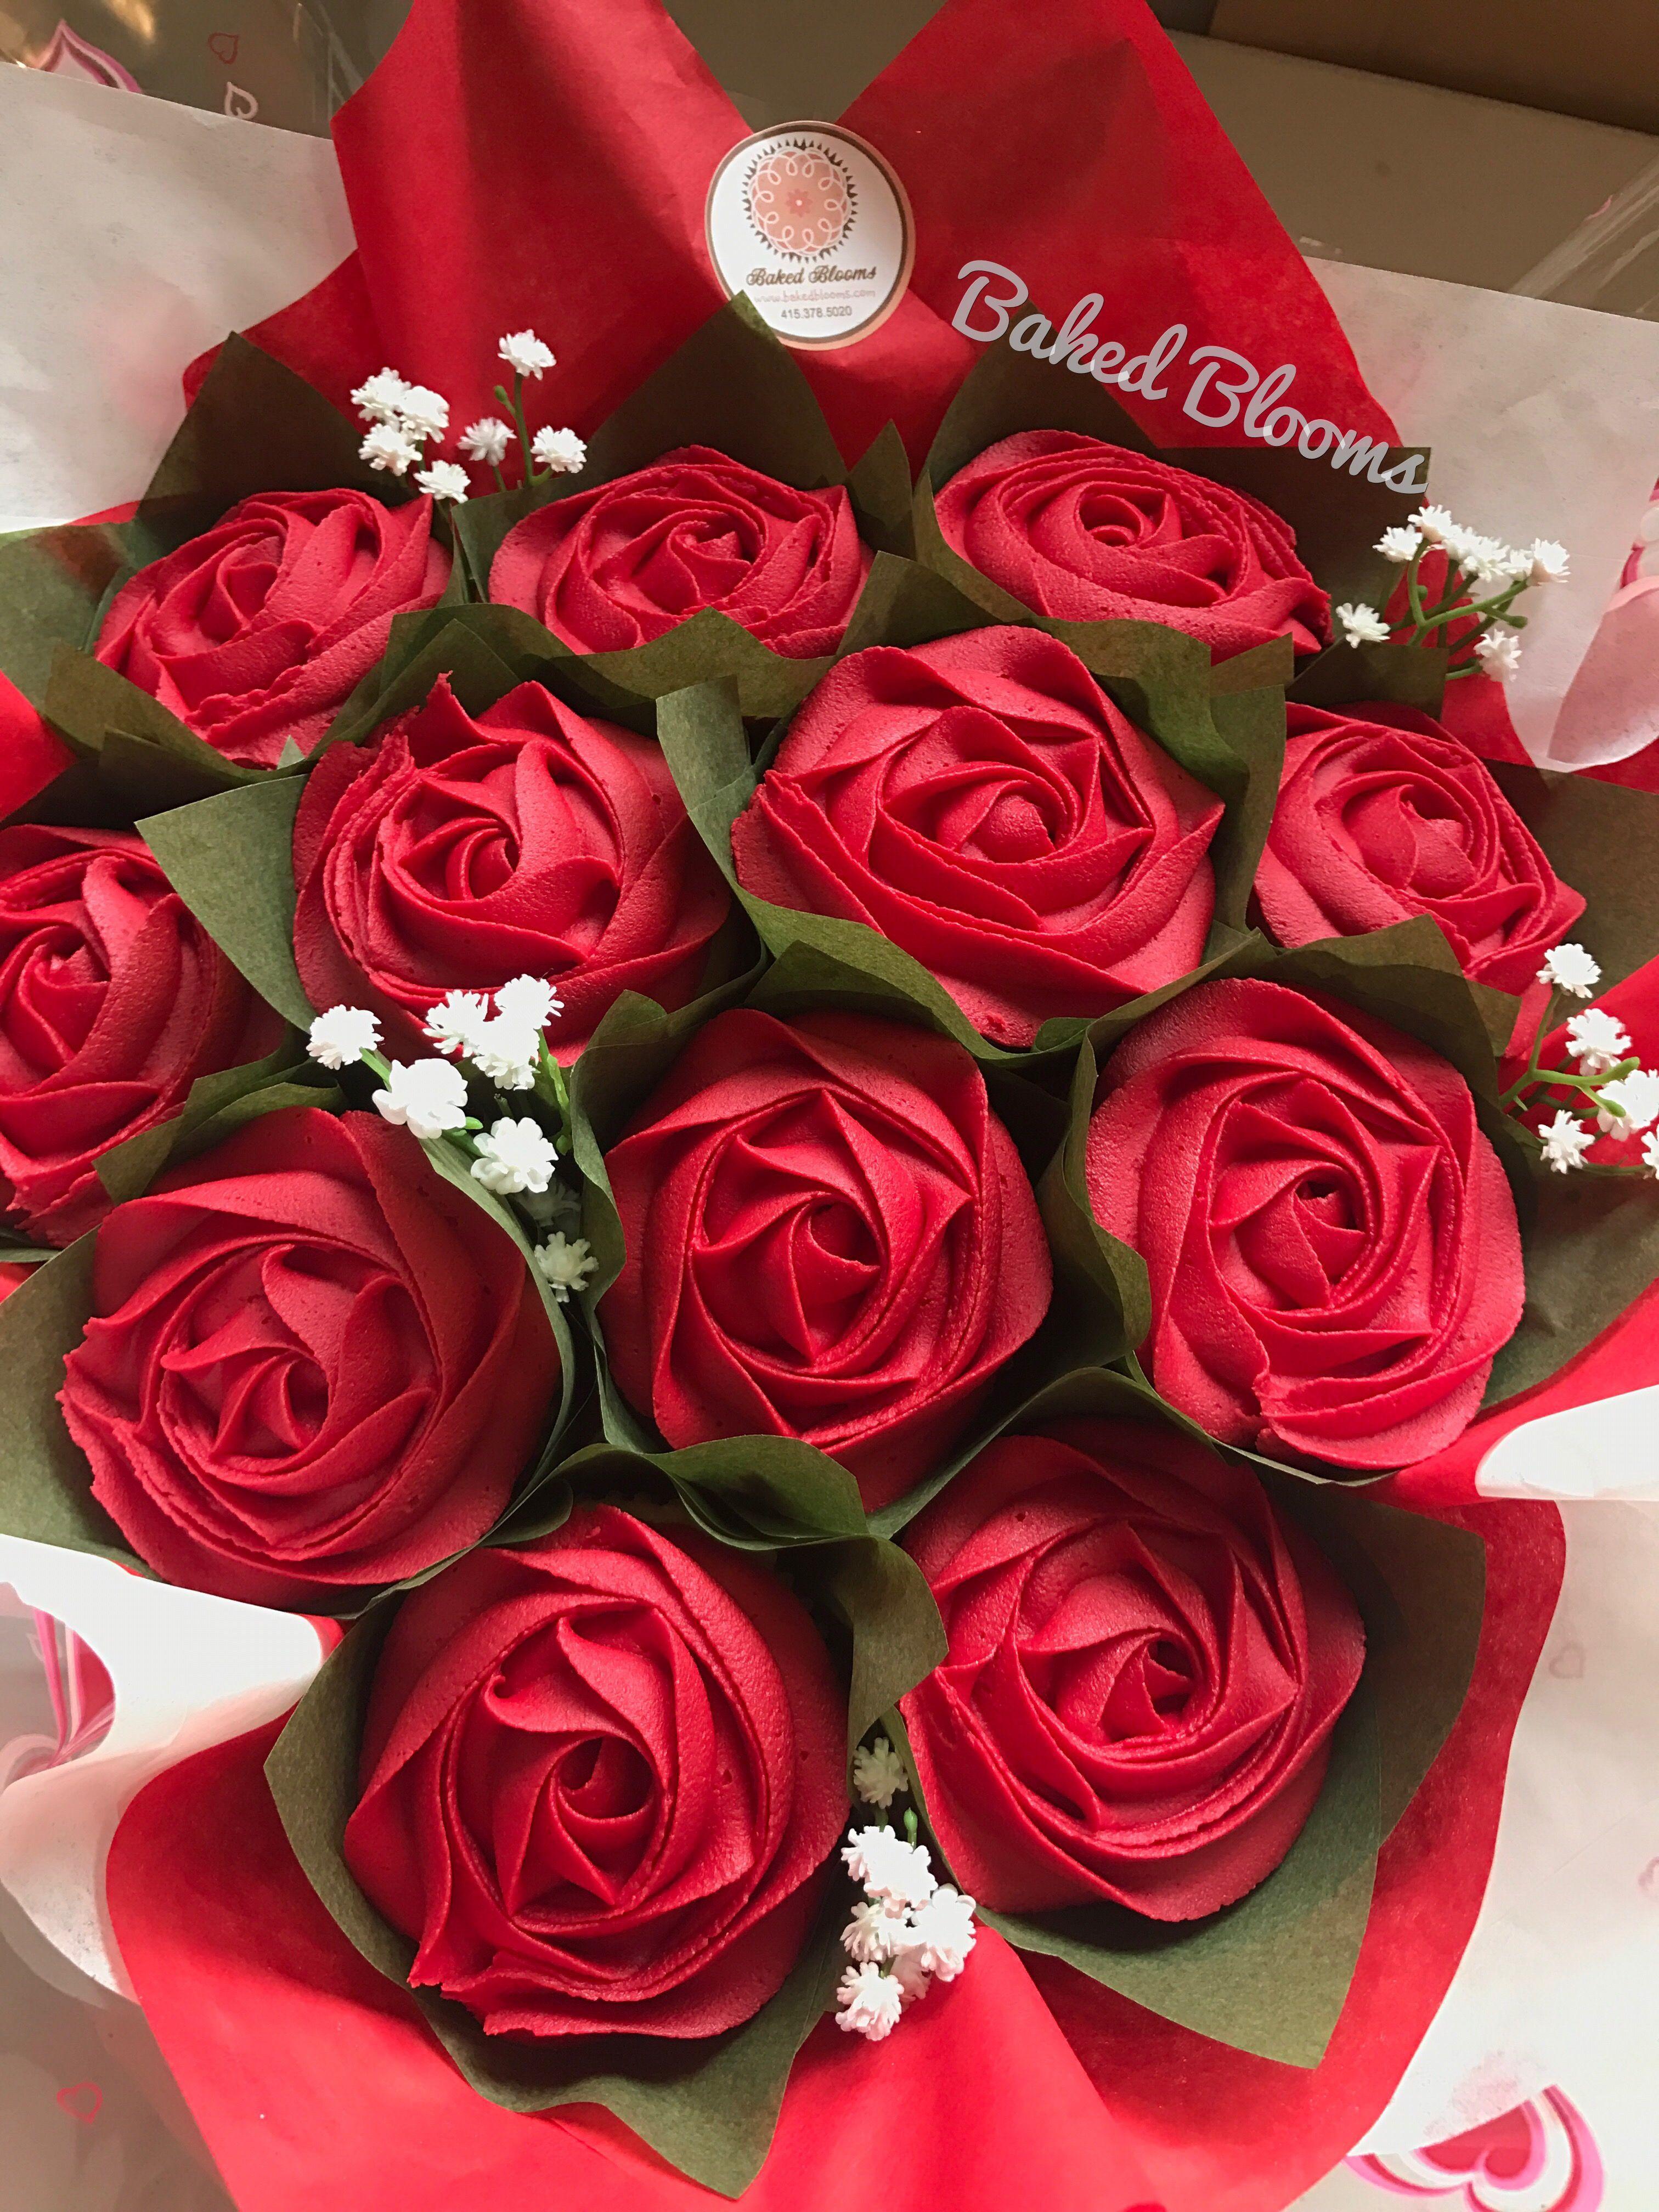 Bouquet of a dozen red rose cupcakes bakedblooms cake bouquet of a dozen red rose cupcakes bakedblooms izmirmasajfo